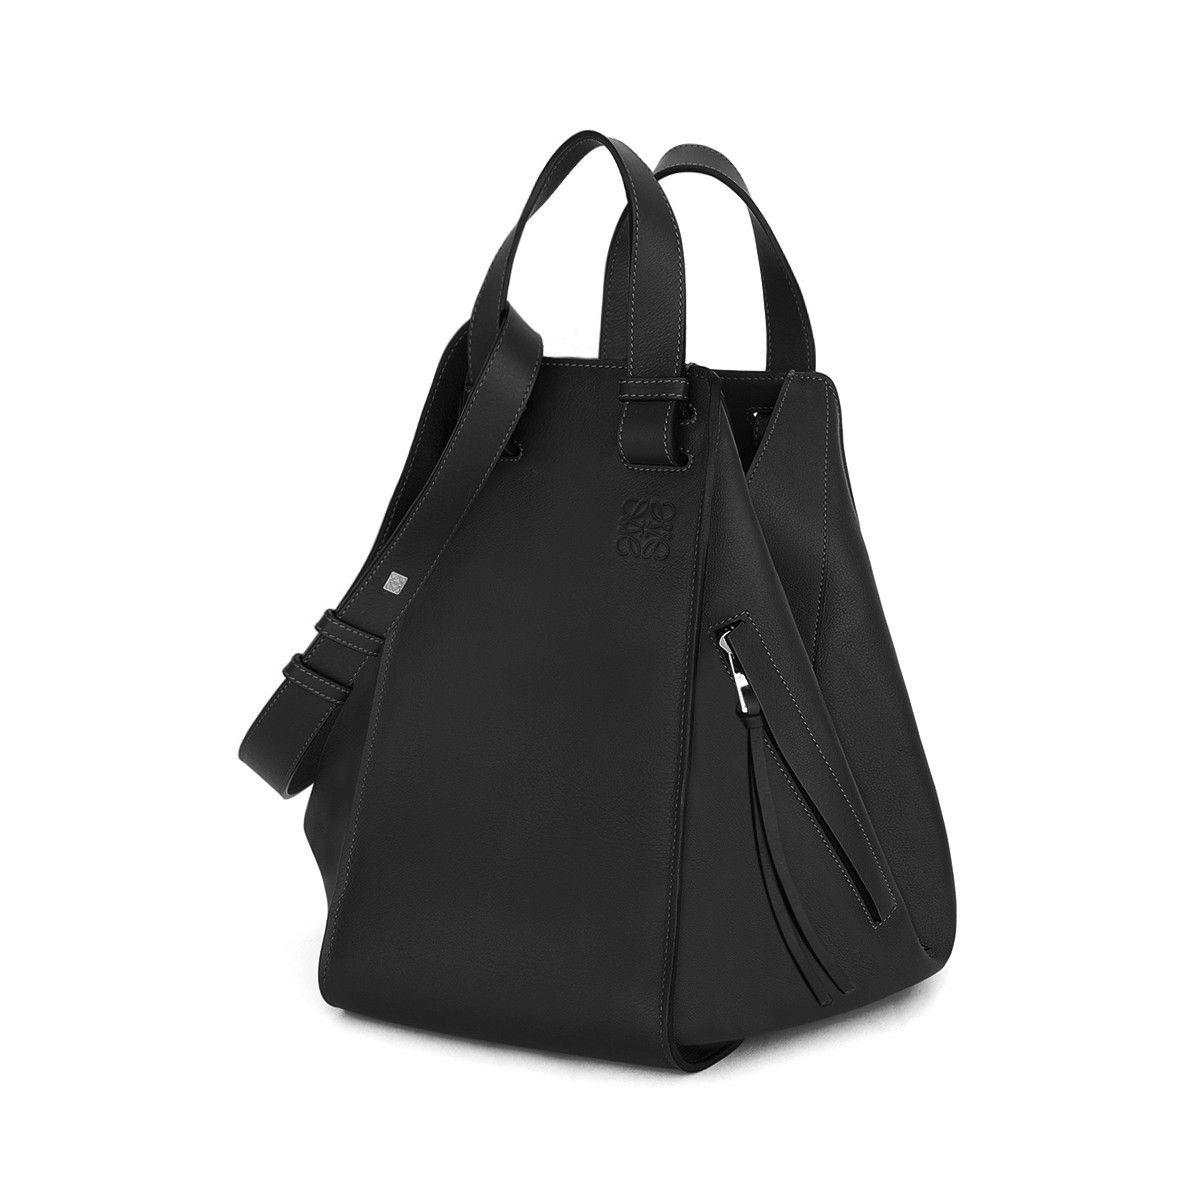 Loewe Bags - HAMMOCK BAG black Discover Loewe Bags products c891e3e6cbef2